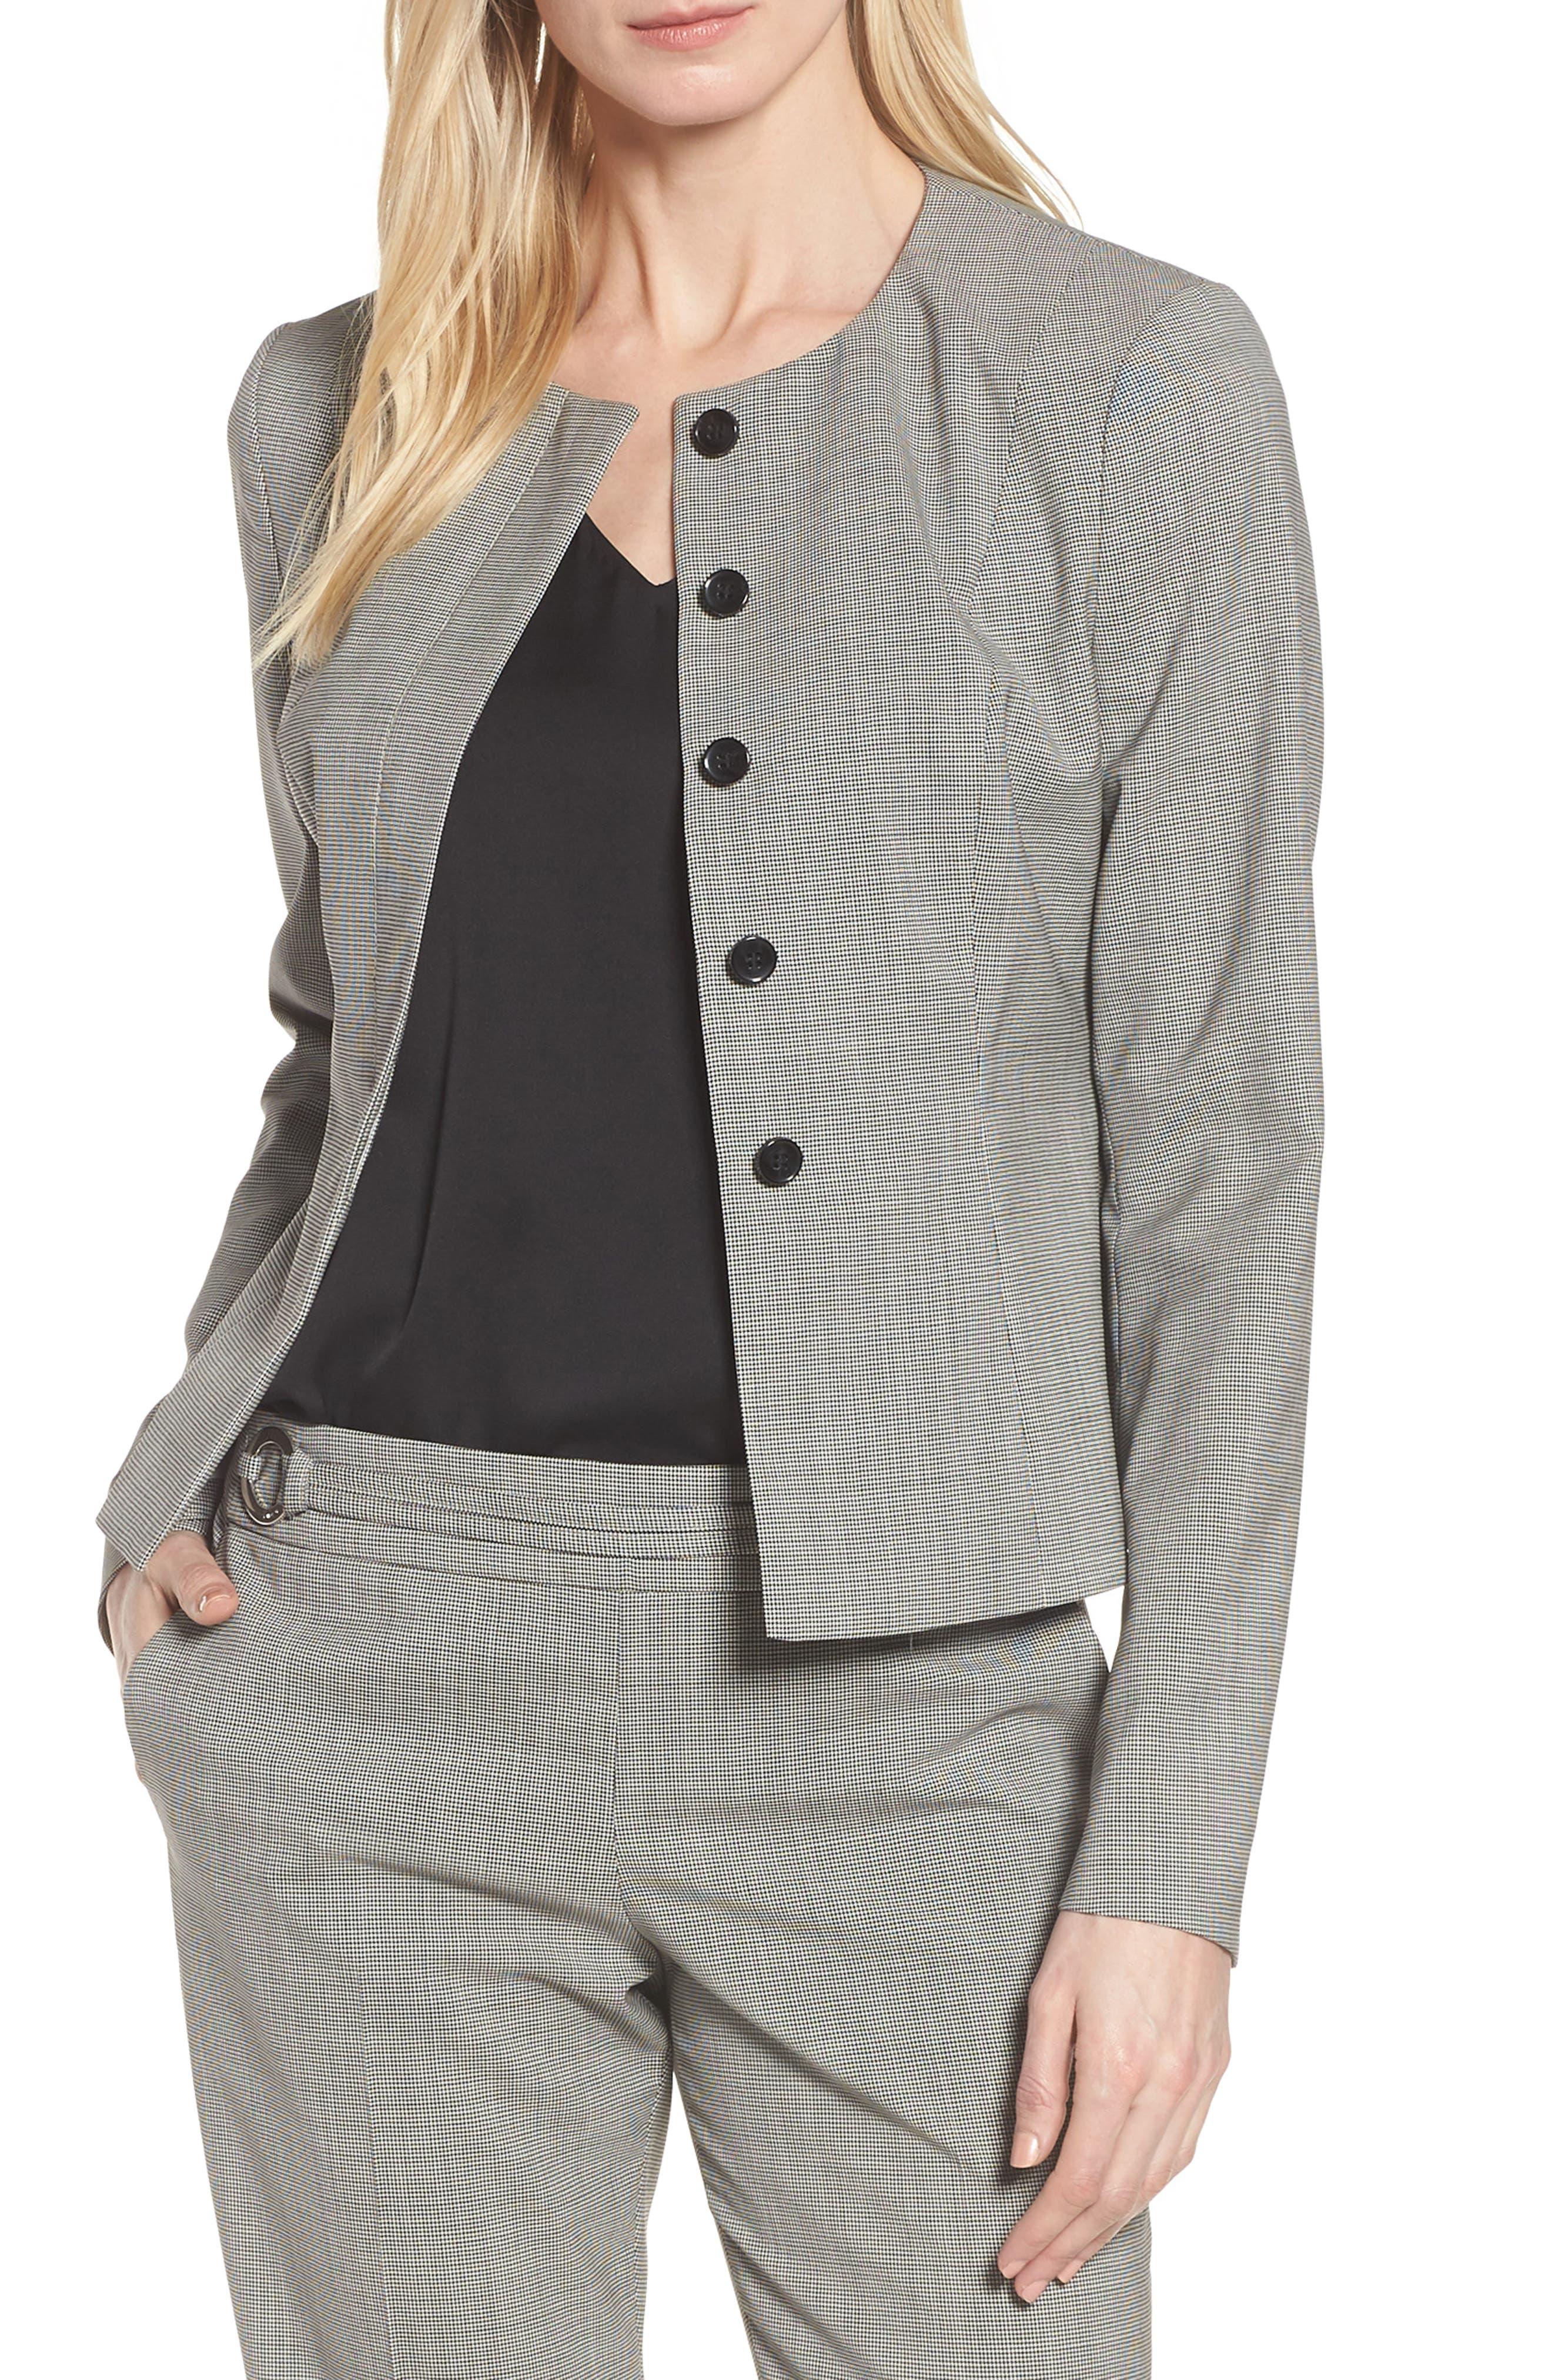 Javilla Stretch Wool Suit Jacket,                         Main,                         color, Black Fantasy